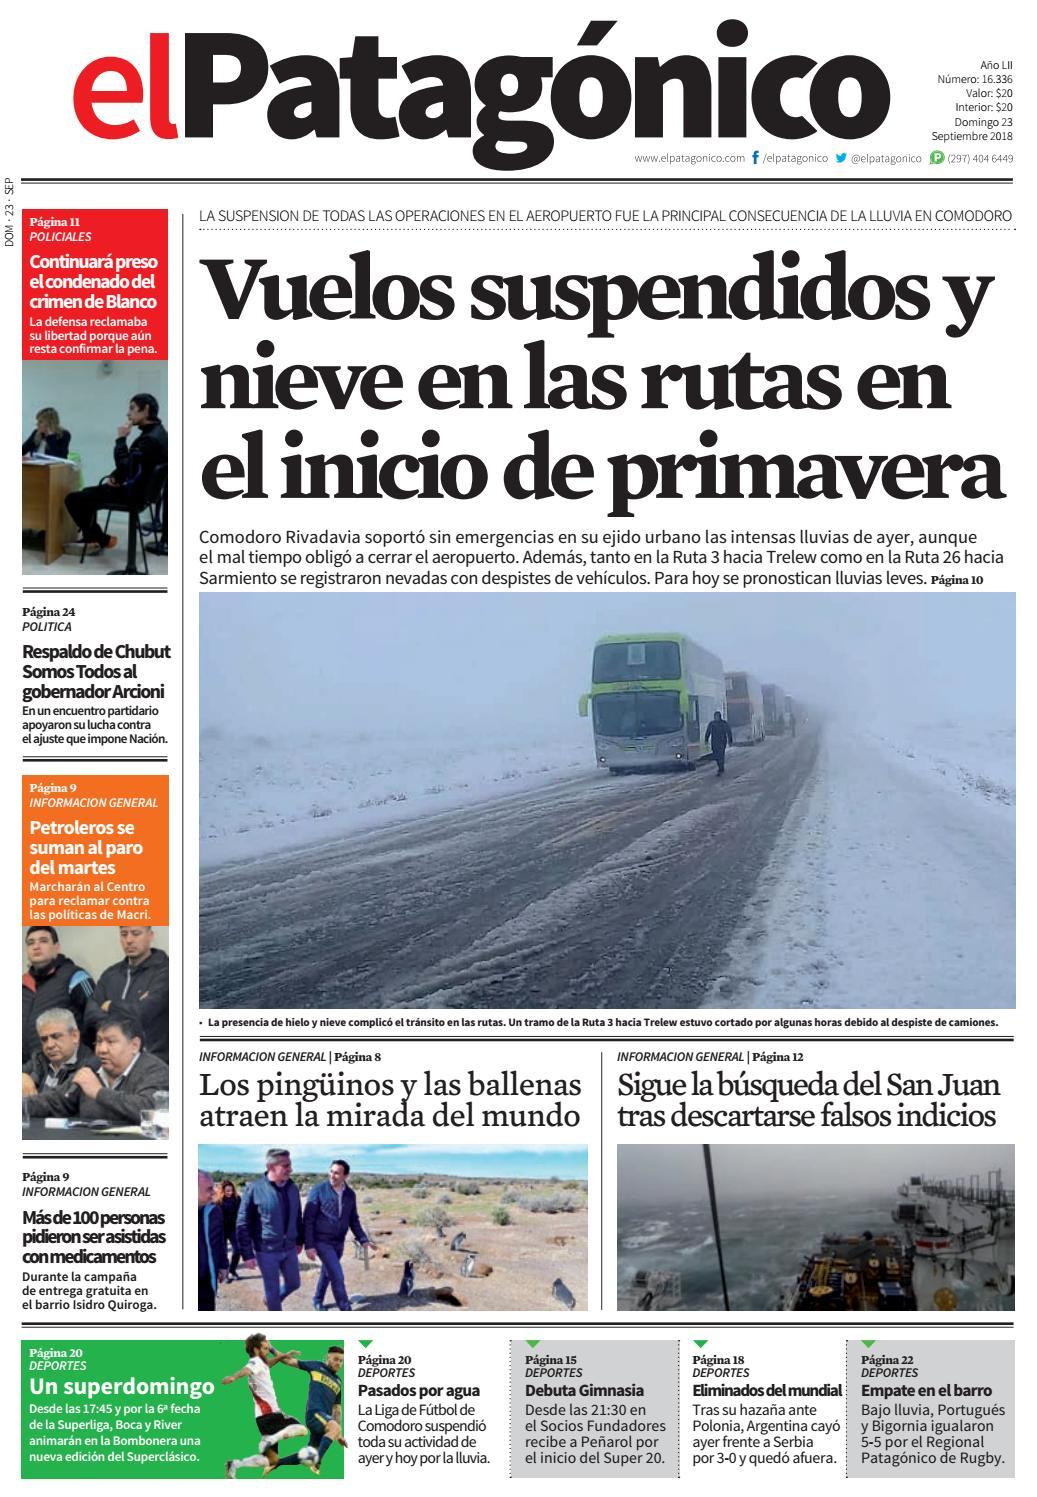 Retiros sin riesgo casino en Portugal afa seleccion argentina 822043